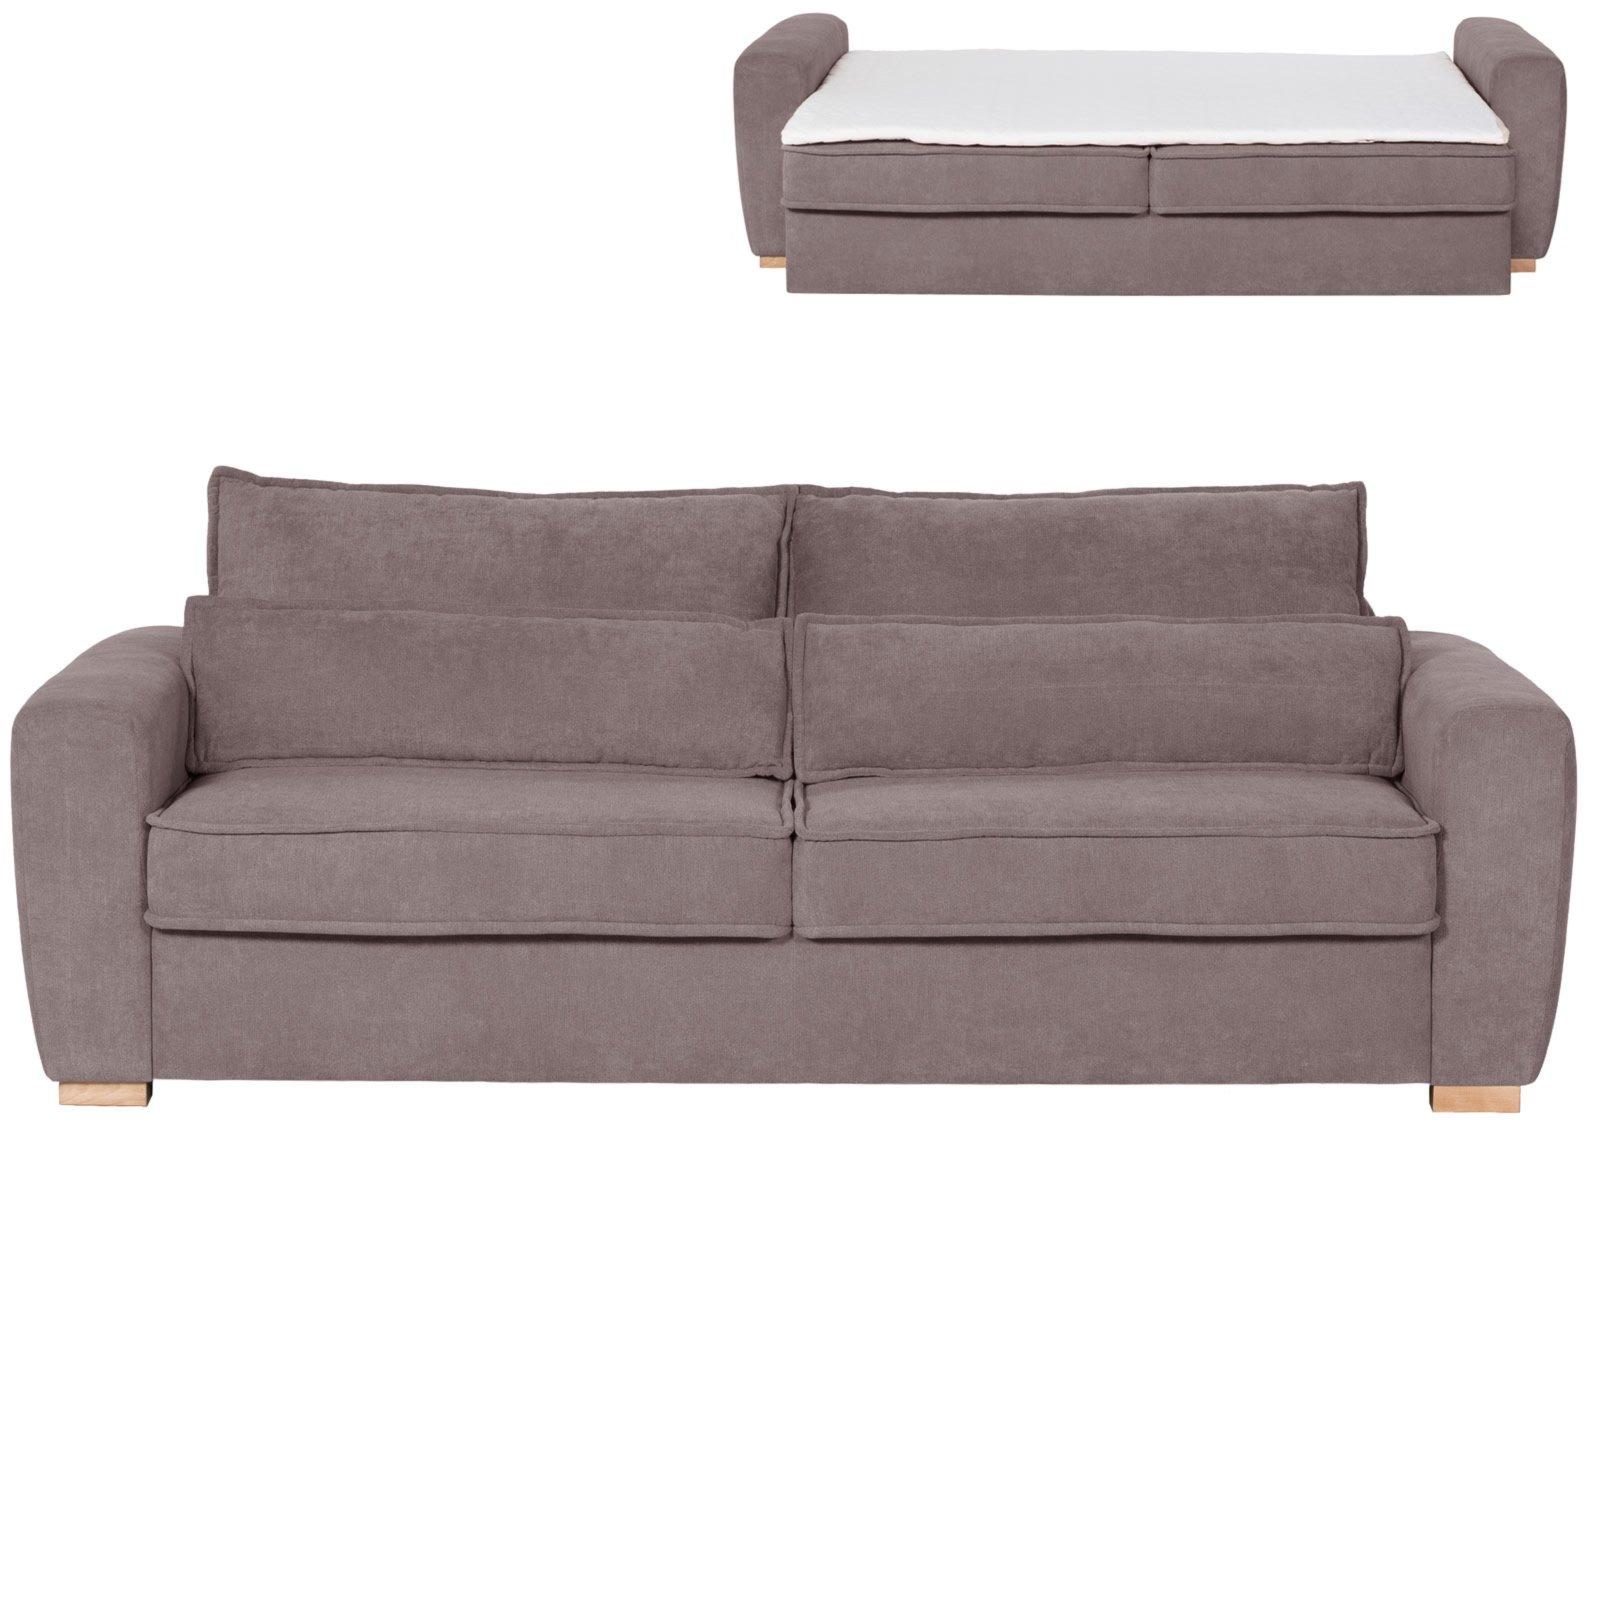 schlafsofa braun mit topper dauerschl fer. Black Bedroom Furniture Sets. Home Design Ideas